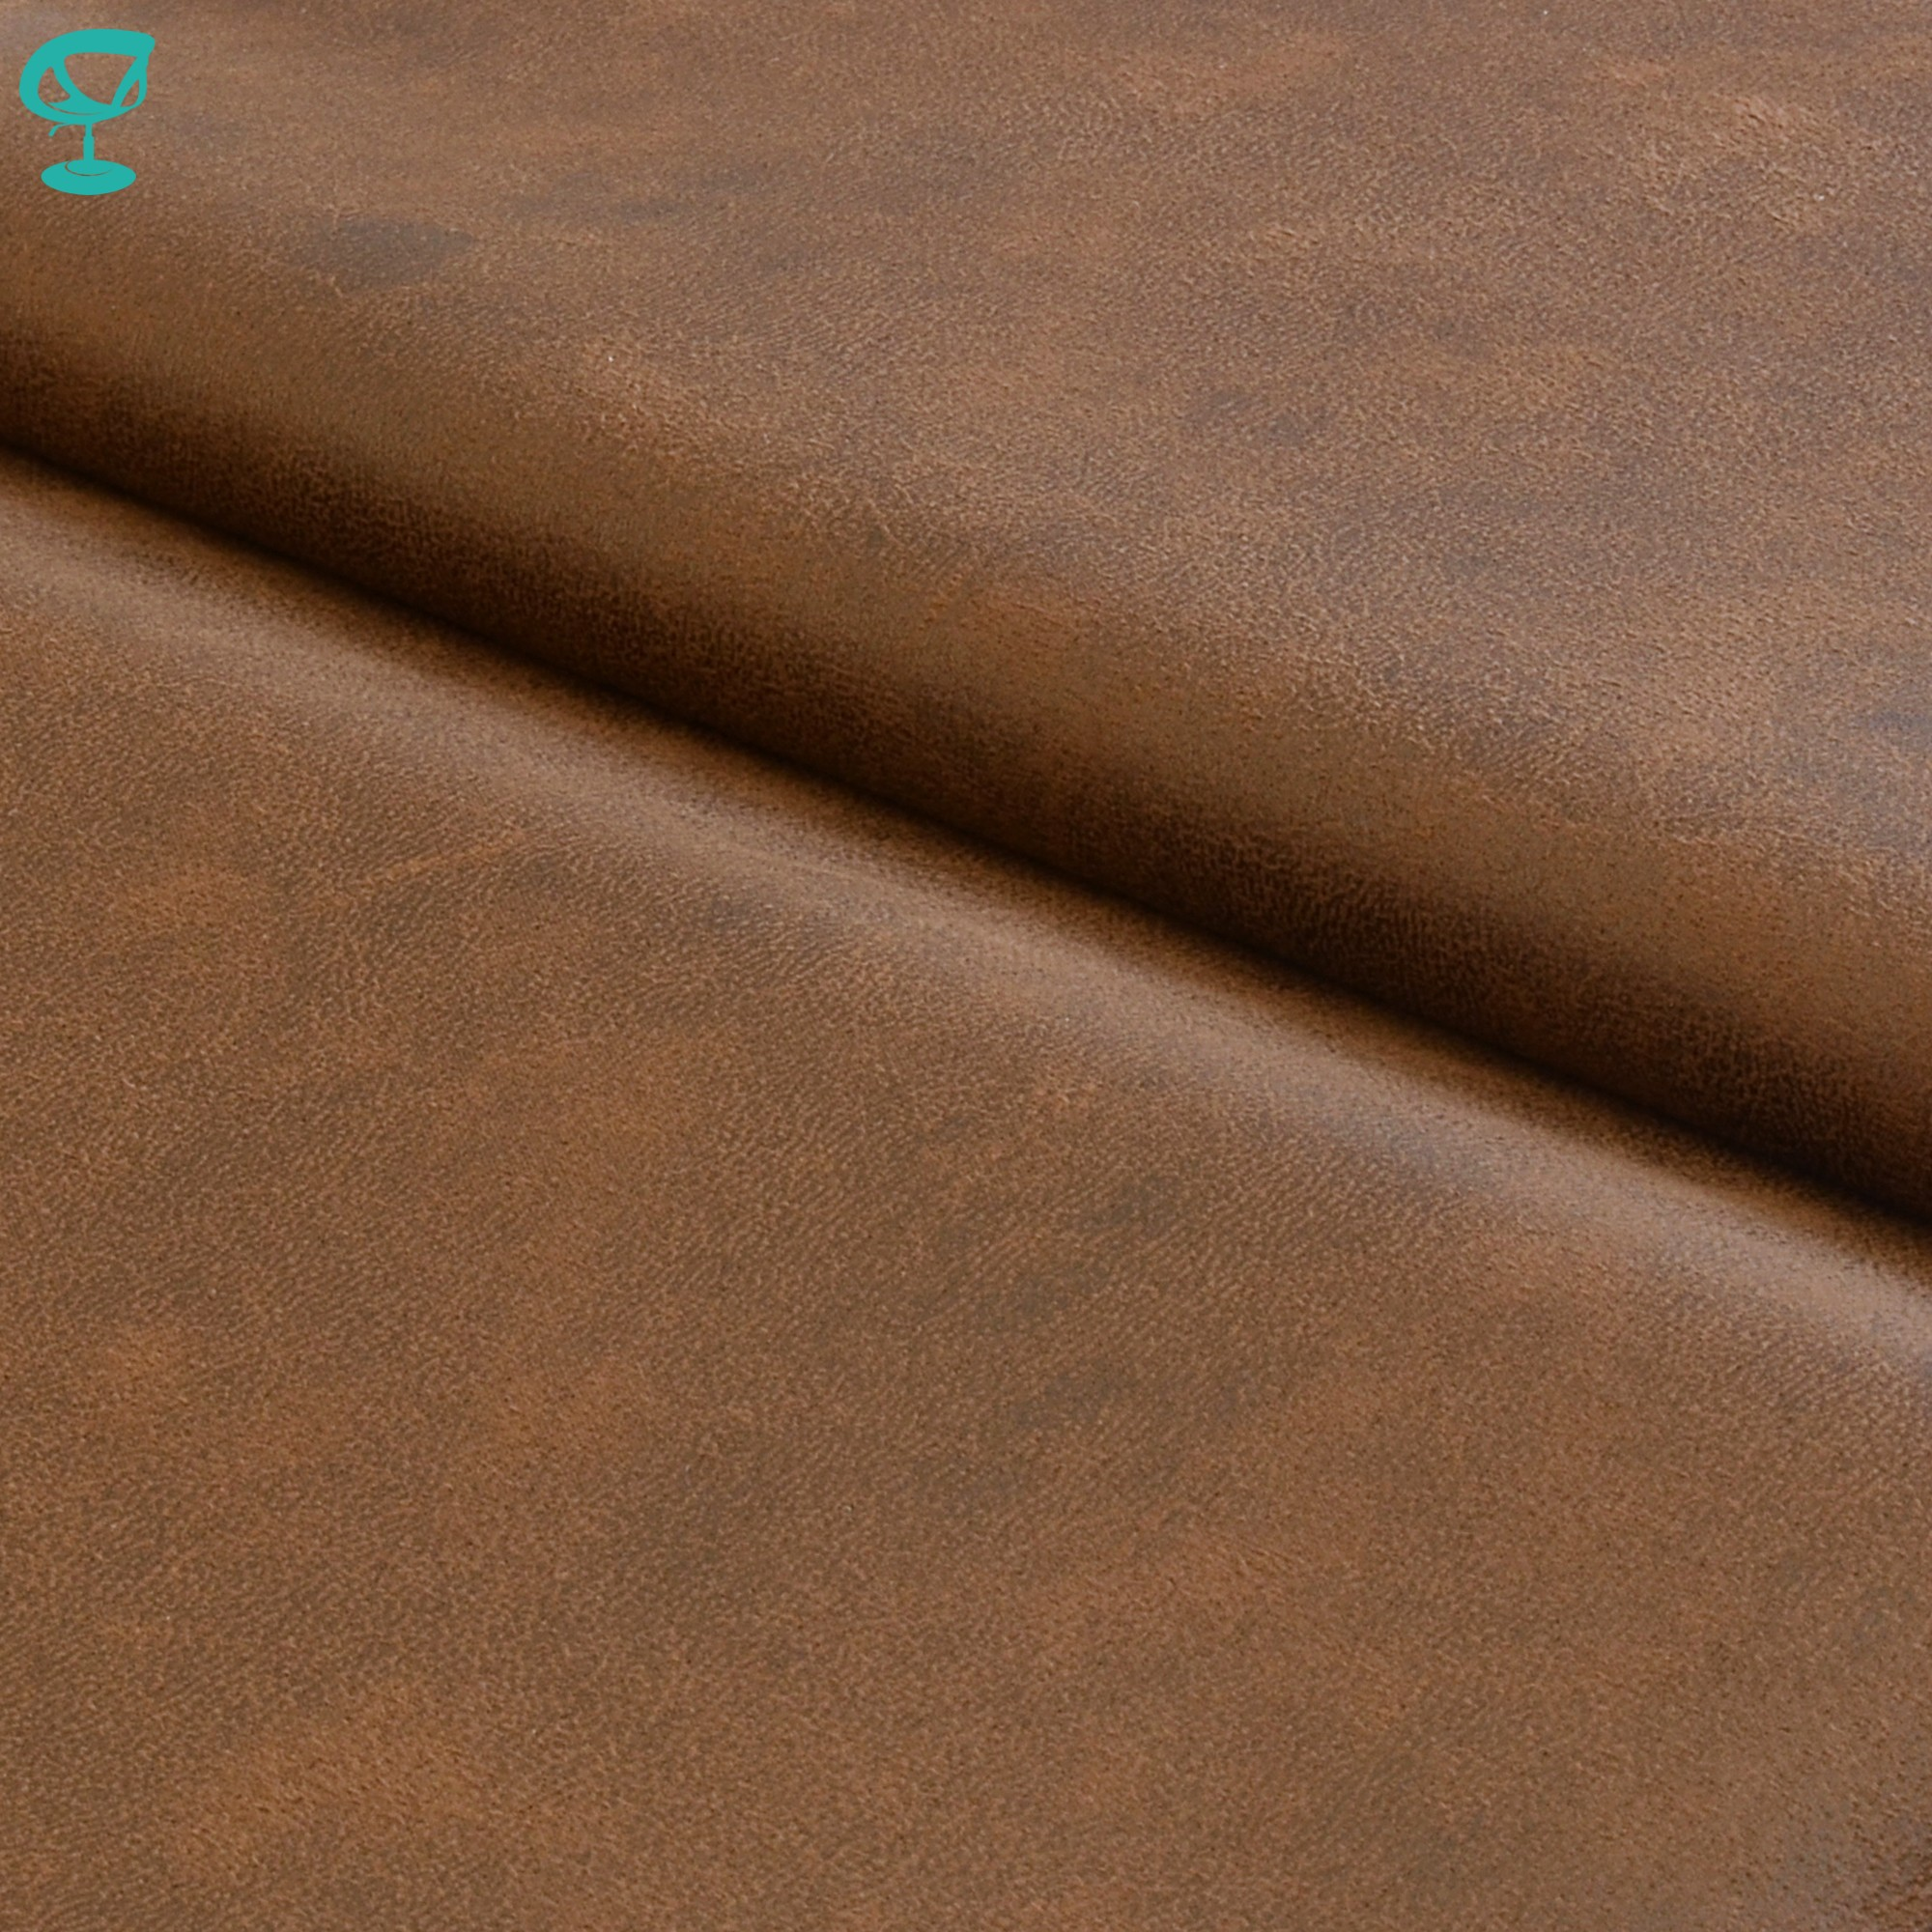 95646 Barneo PK970-18 Fabric Furniture Nubuck Polyester обивочный Material For мебельного Production Necking Chairs Sofas